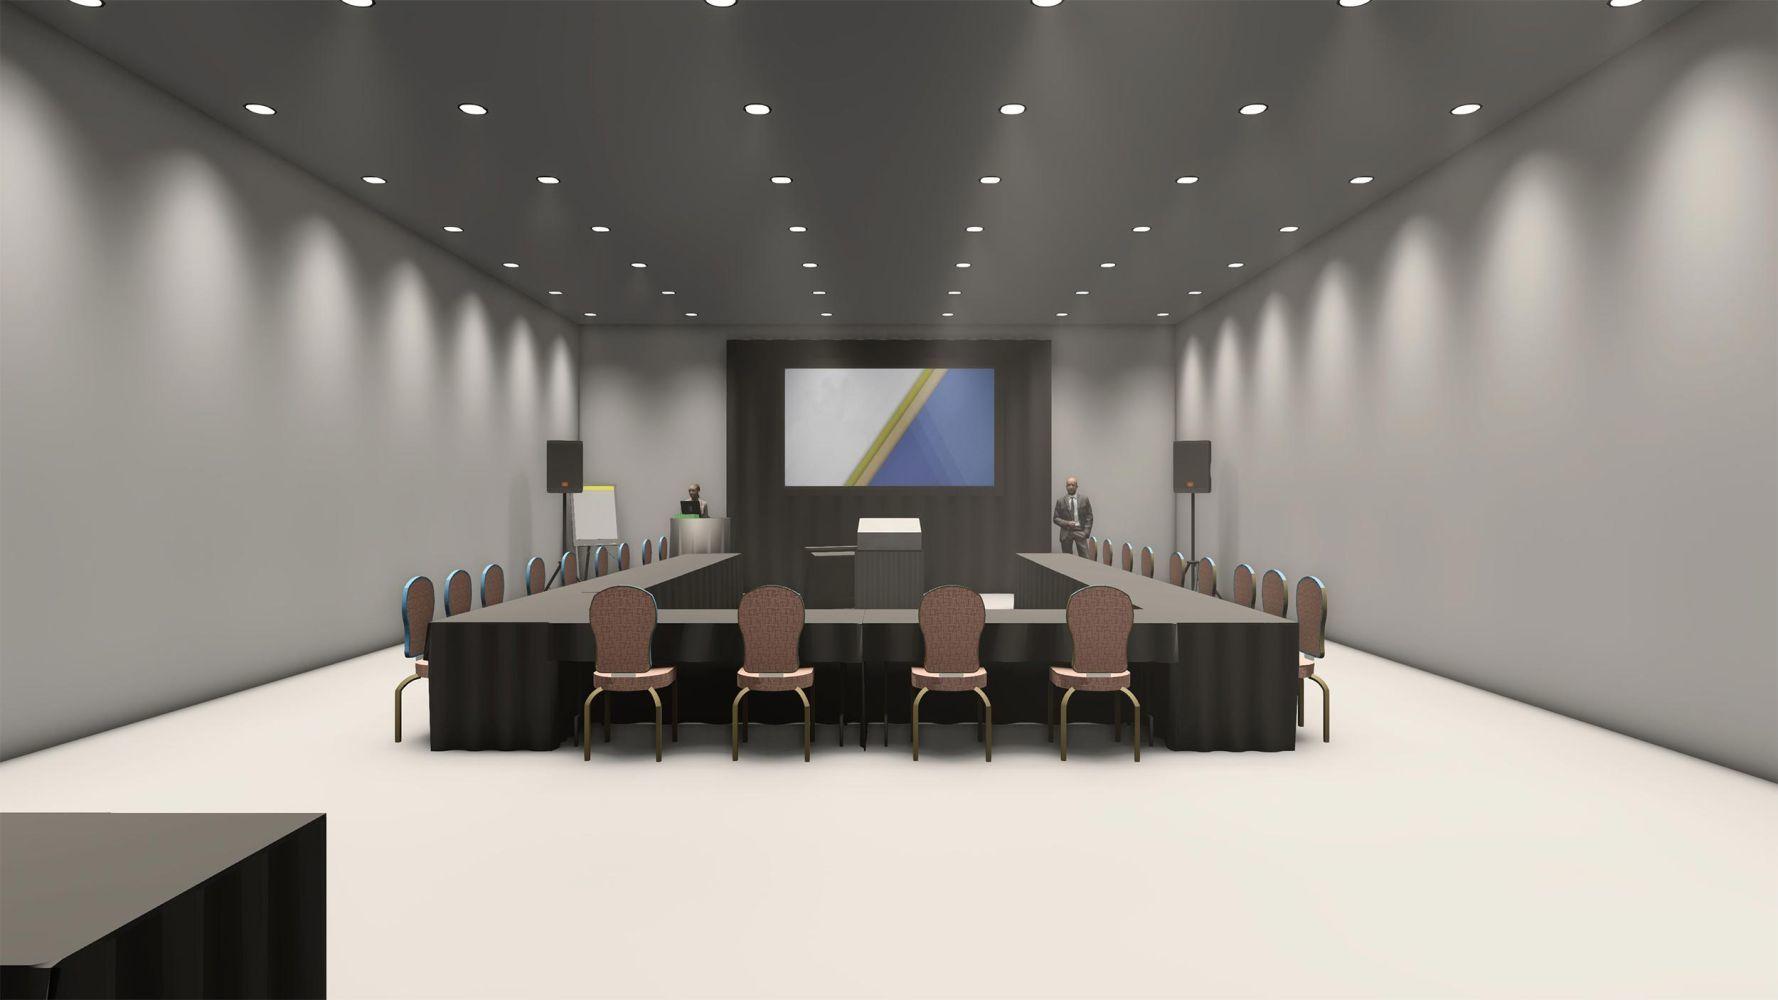 An advisory board presenting a deck virtually